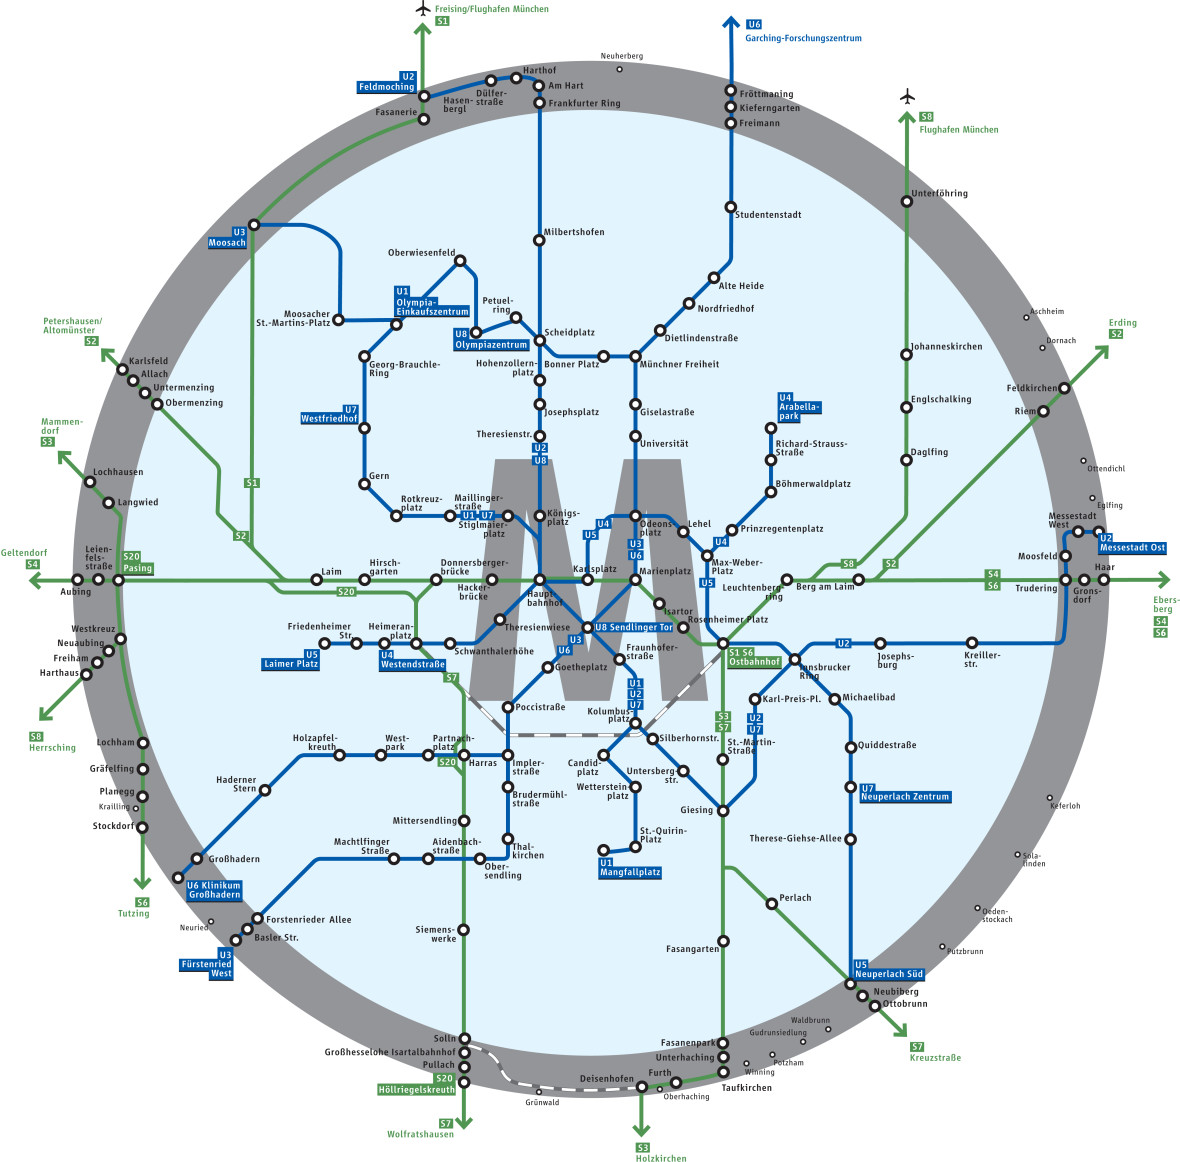 Mvv Zonen Karte.Mvv Beschliesst Tarifreform Ab 2019 Das Offizielle